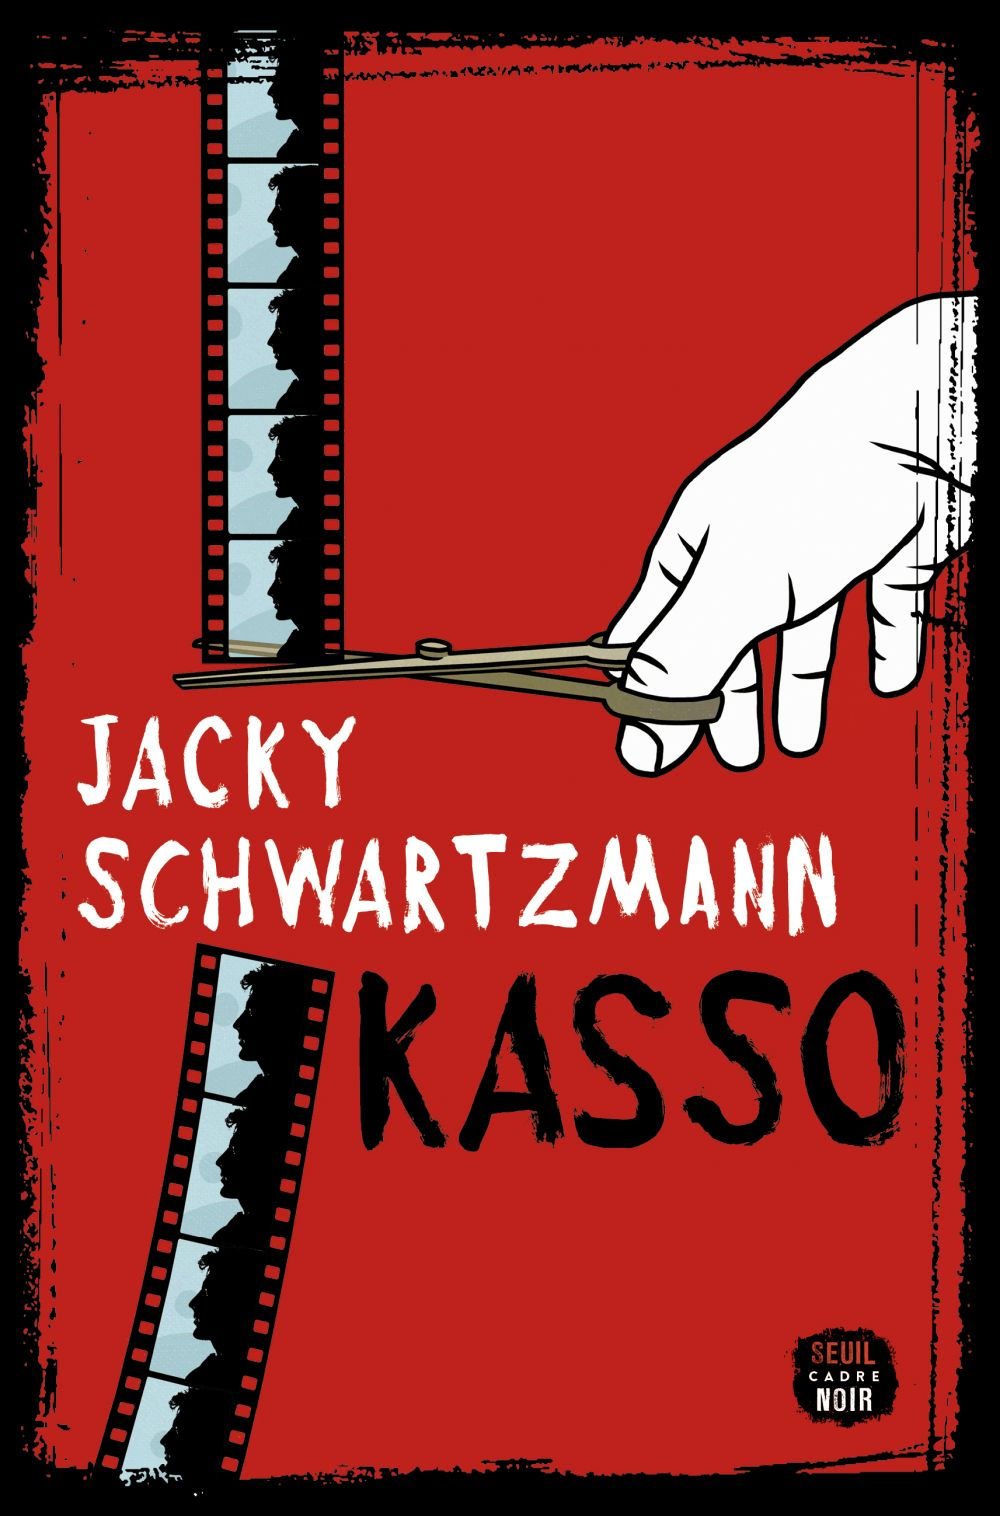 Kasso |